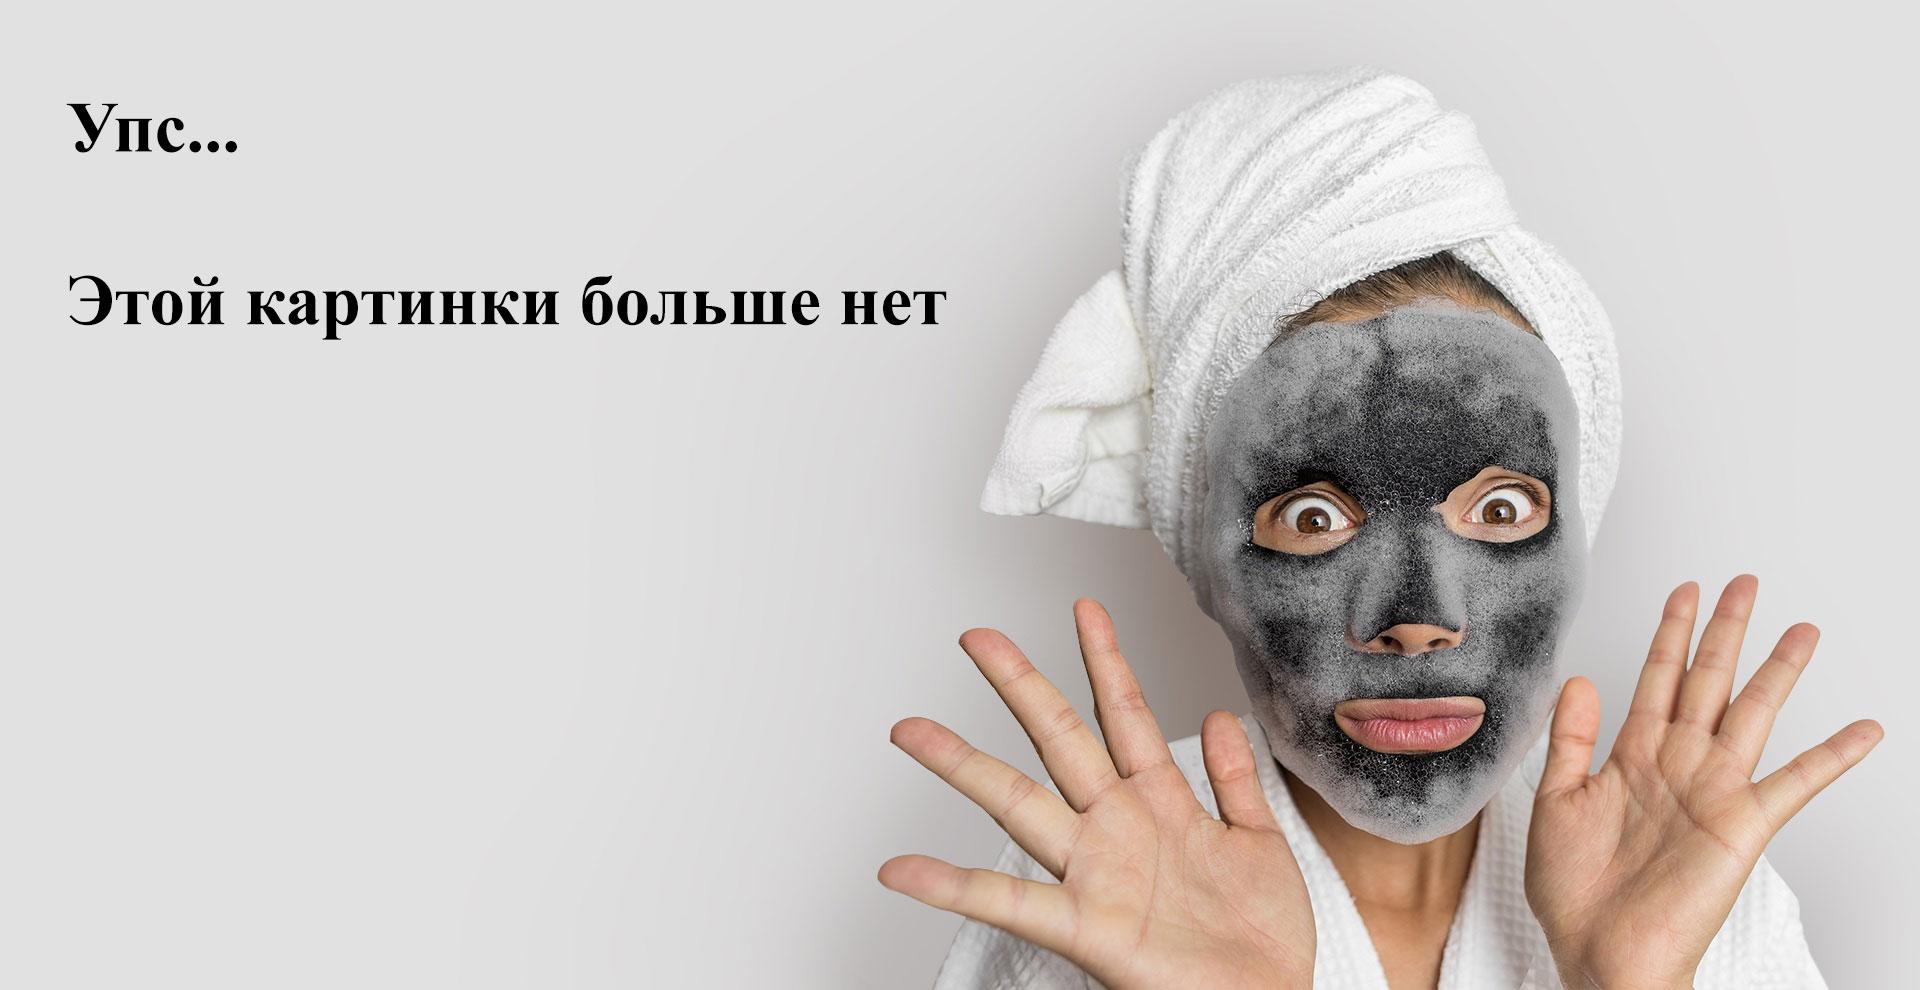 Patrisa Nail, Гель-лак Московская сага №771